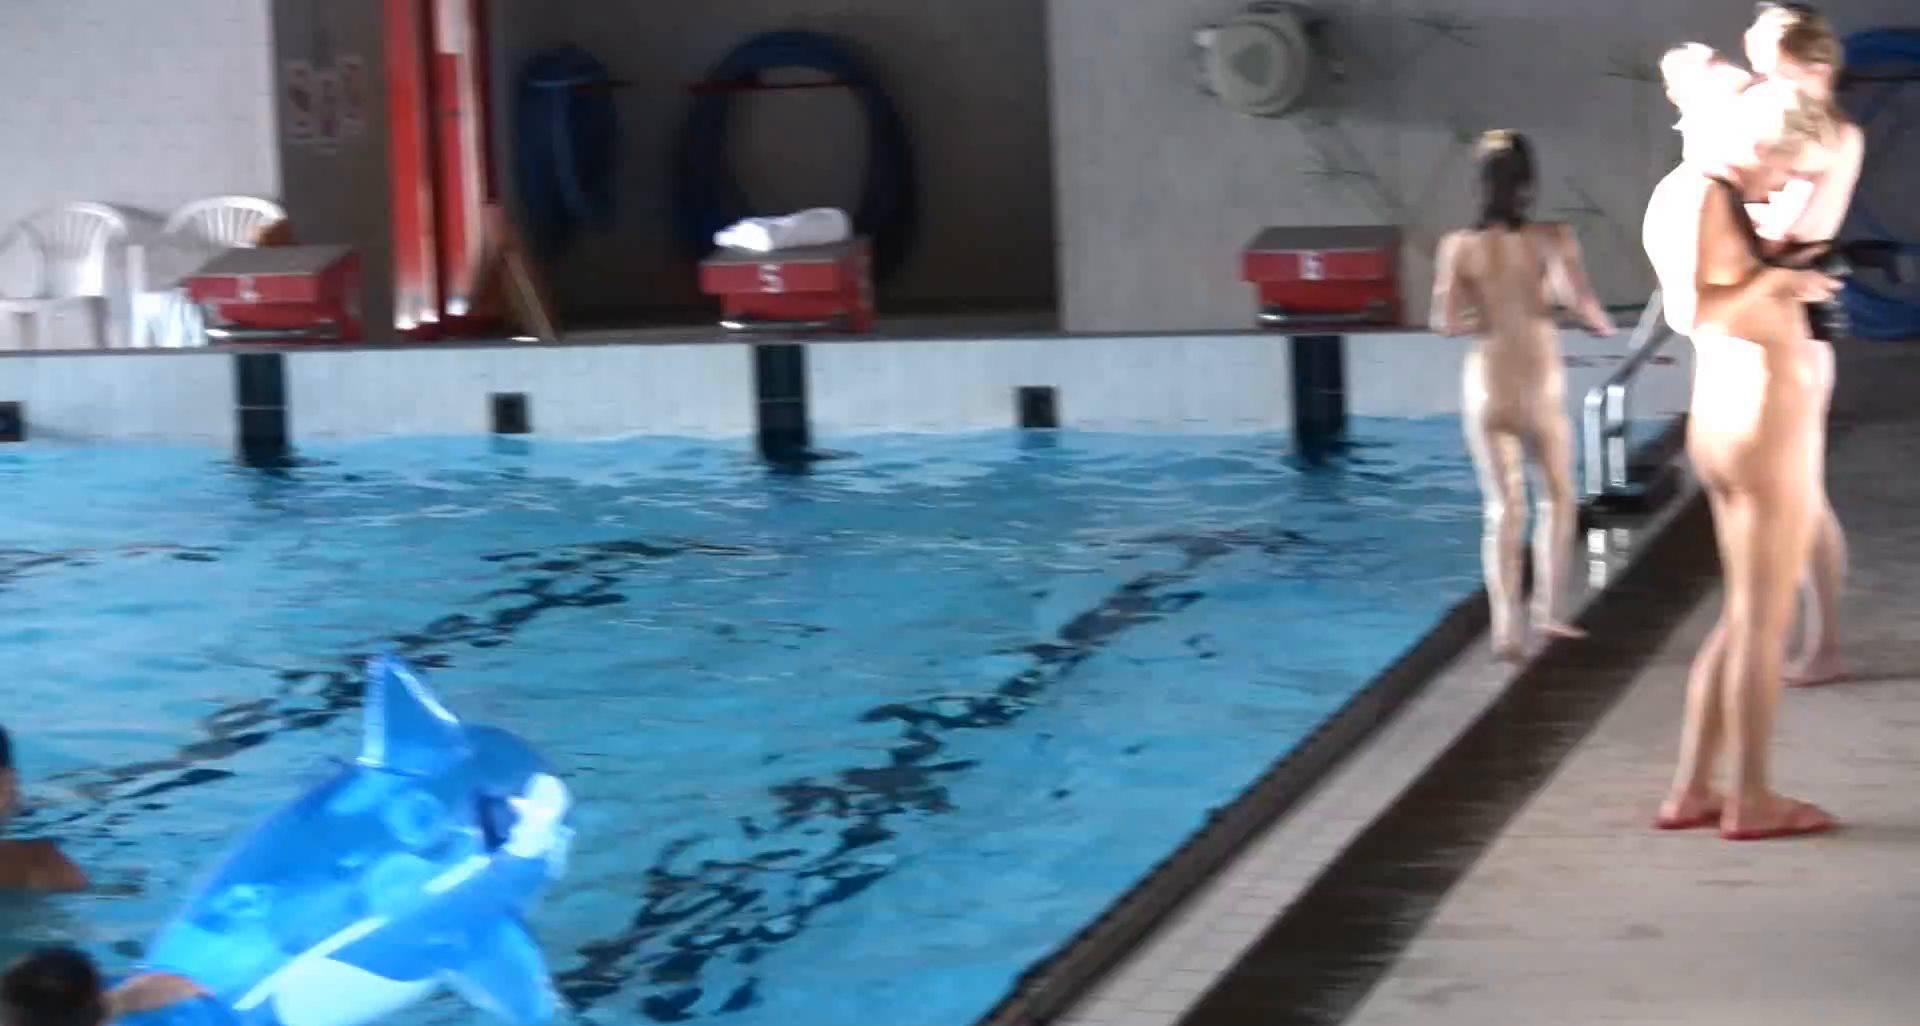 FKK Videos Floating On Our Rafts 2 - 2